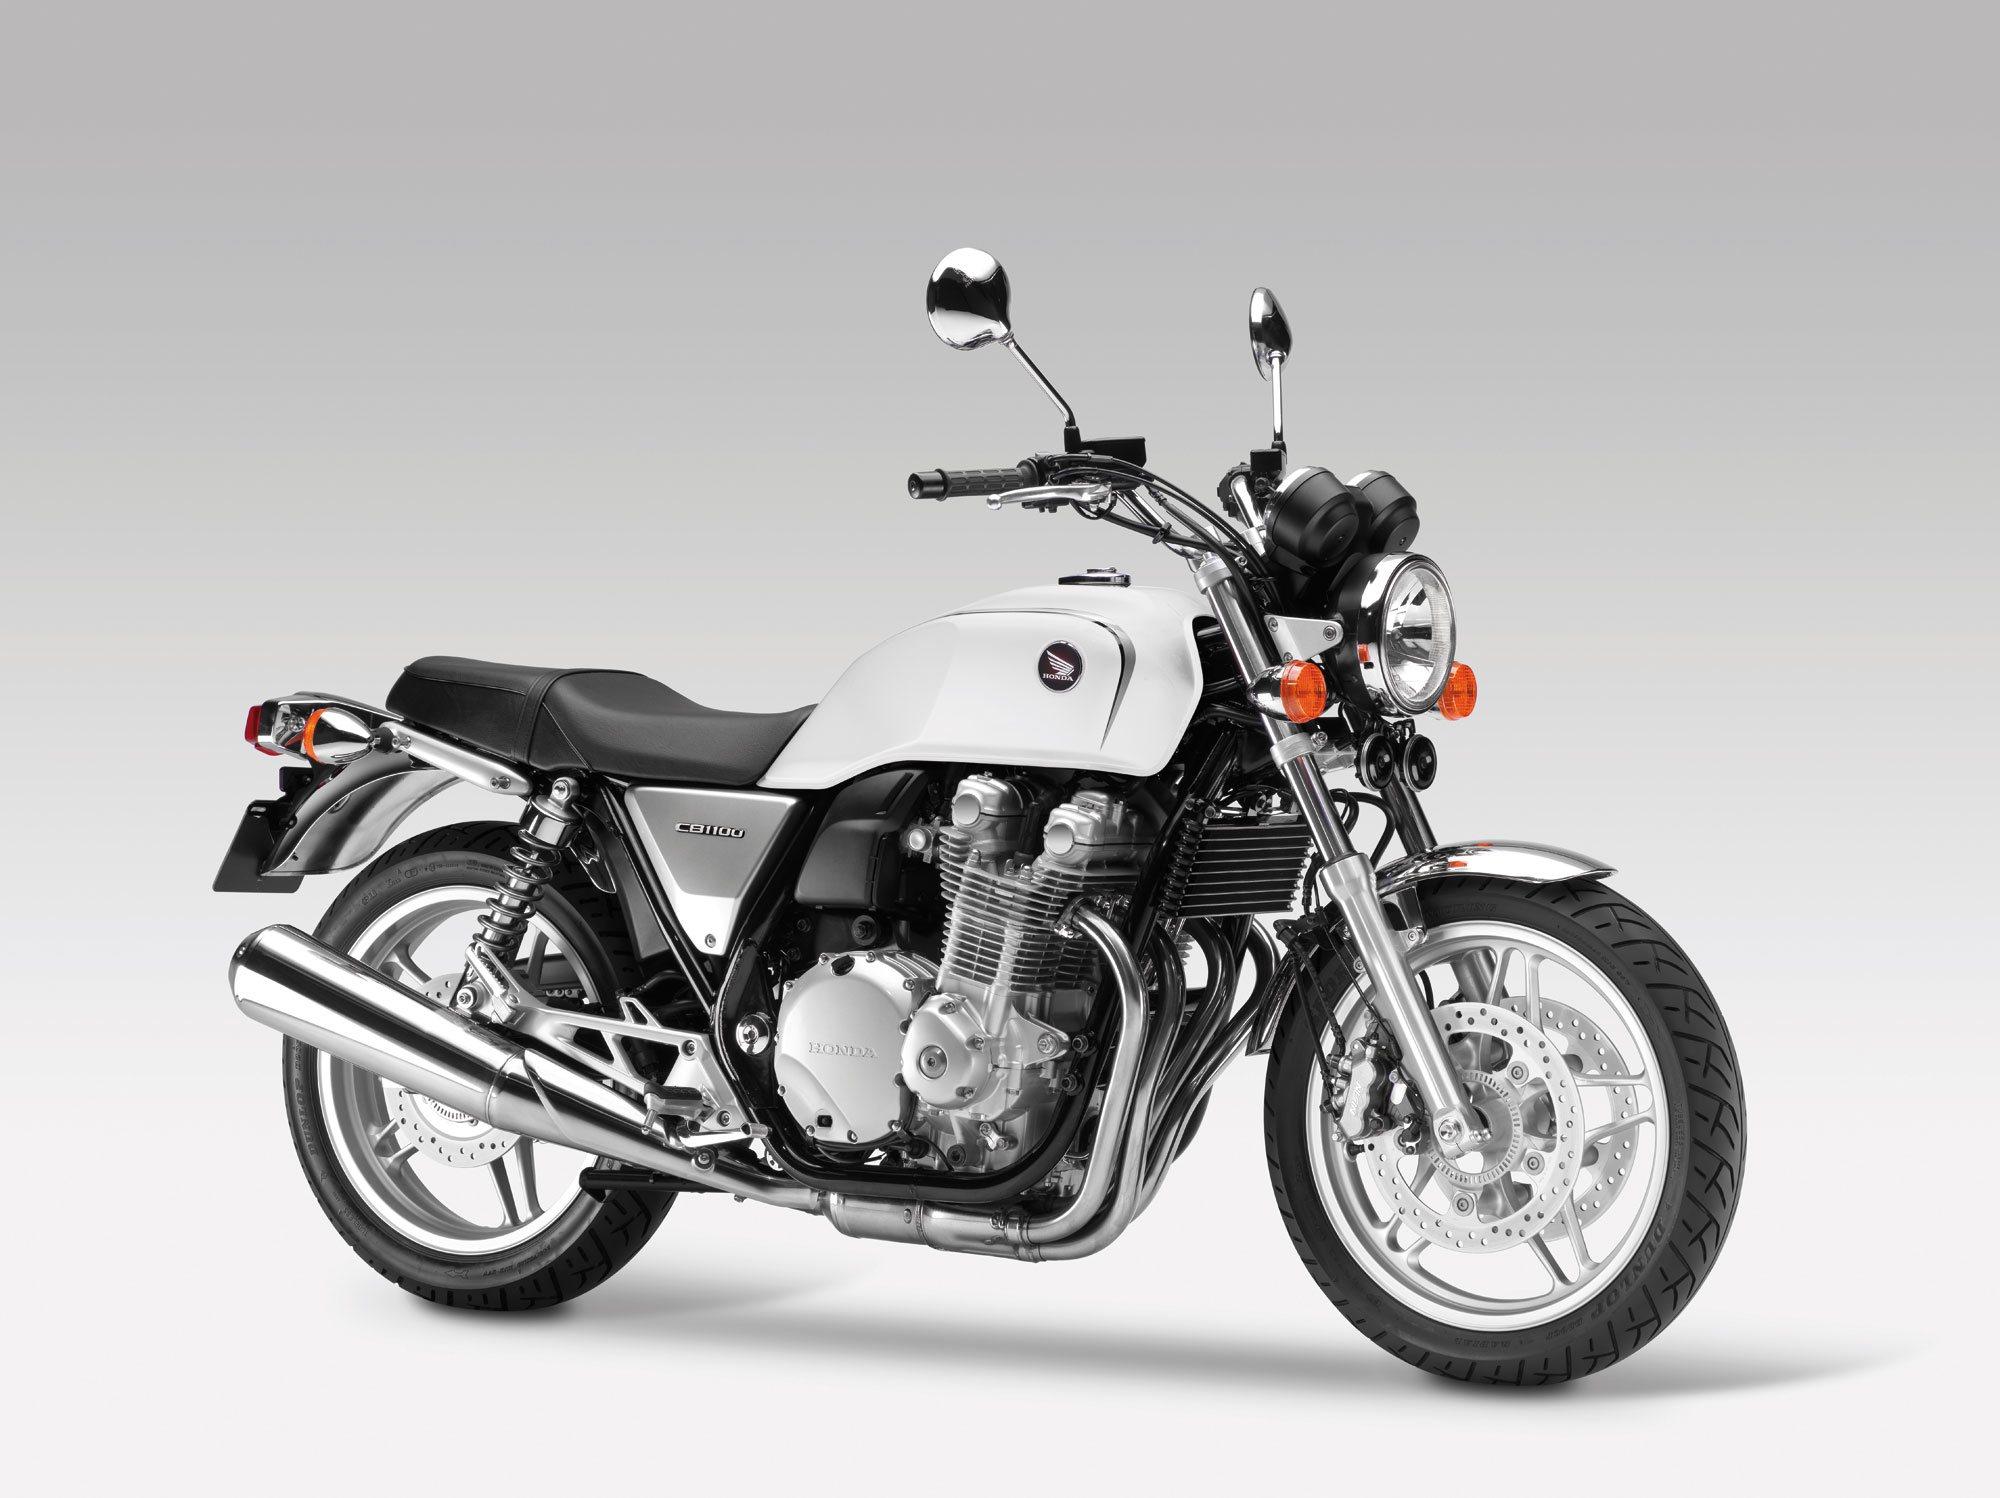 HONDA CB1100A ABS specs - 2012, 2013 - autoevolution